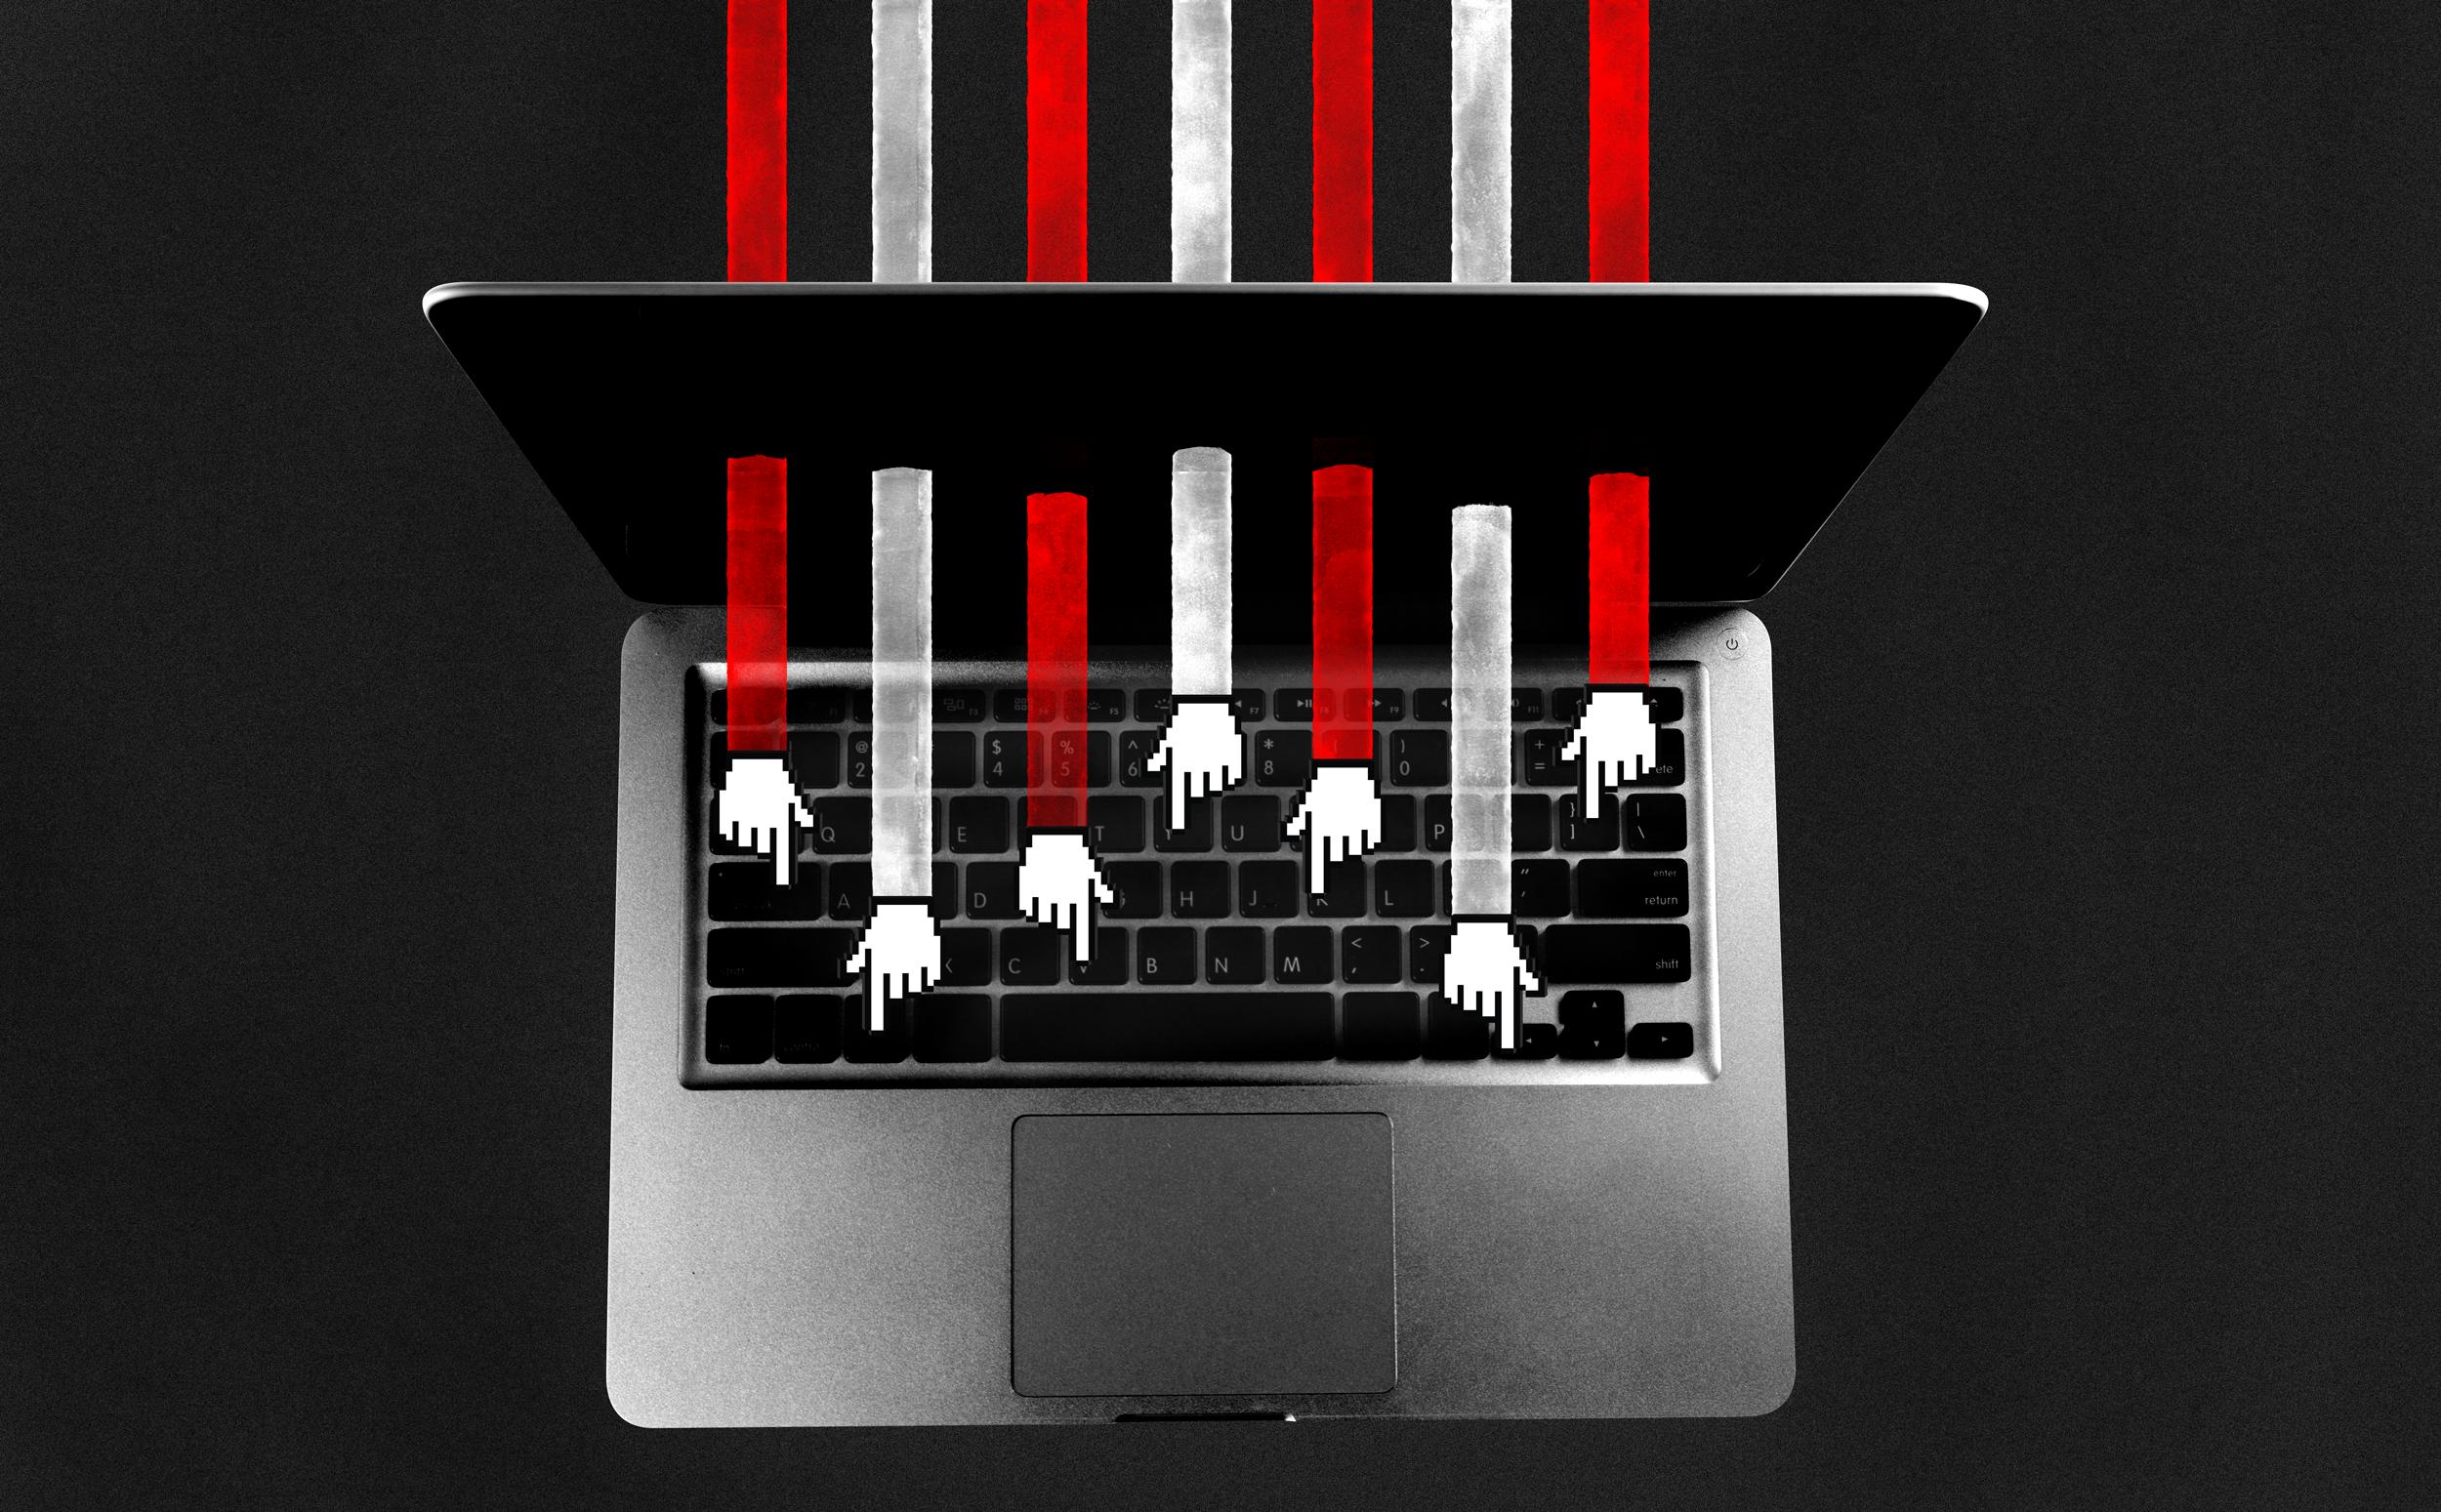 FBI_government-hack-computer-2500.png